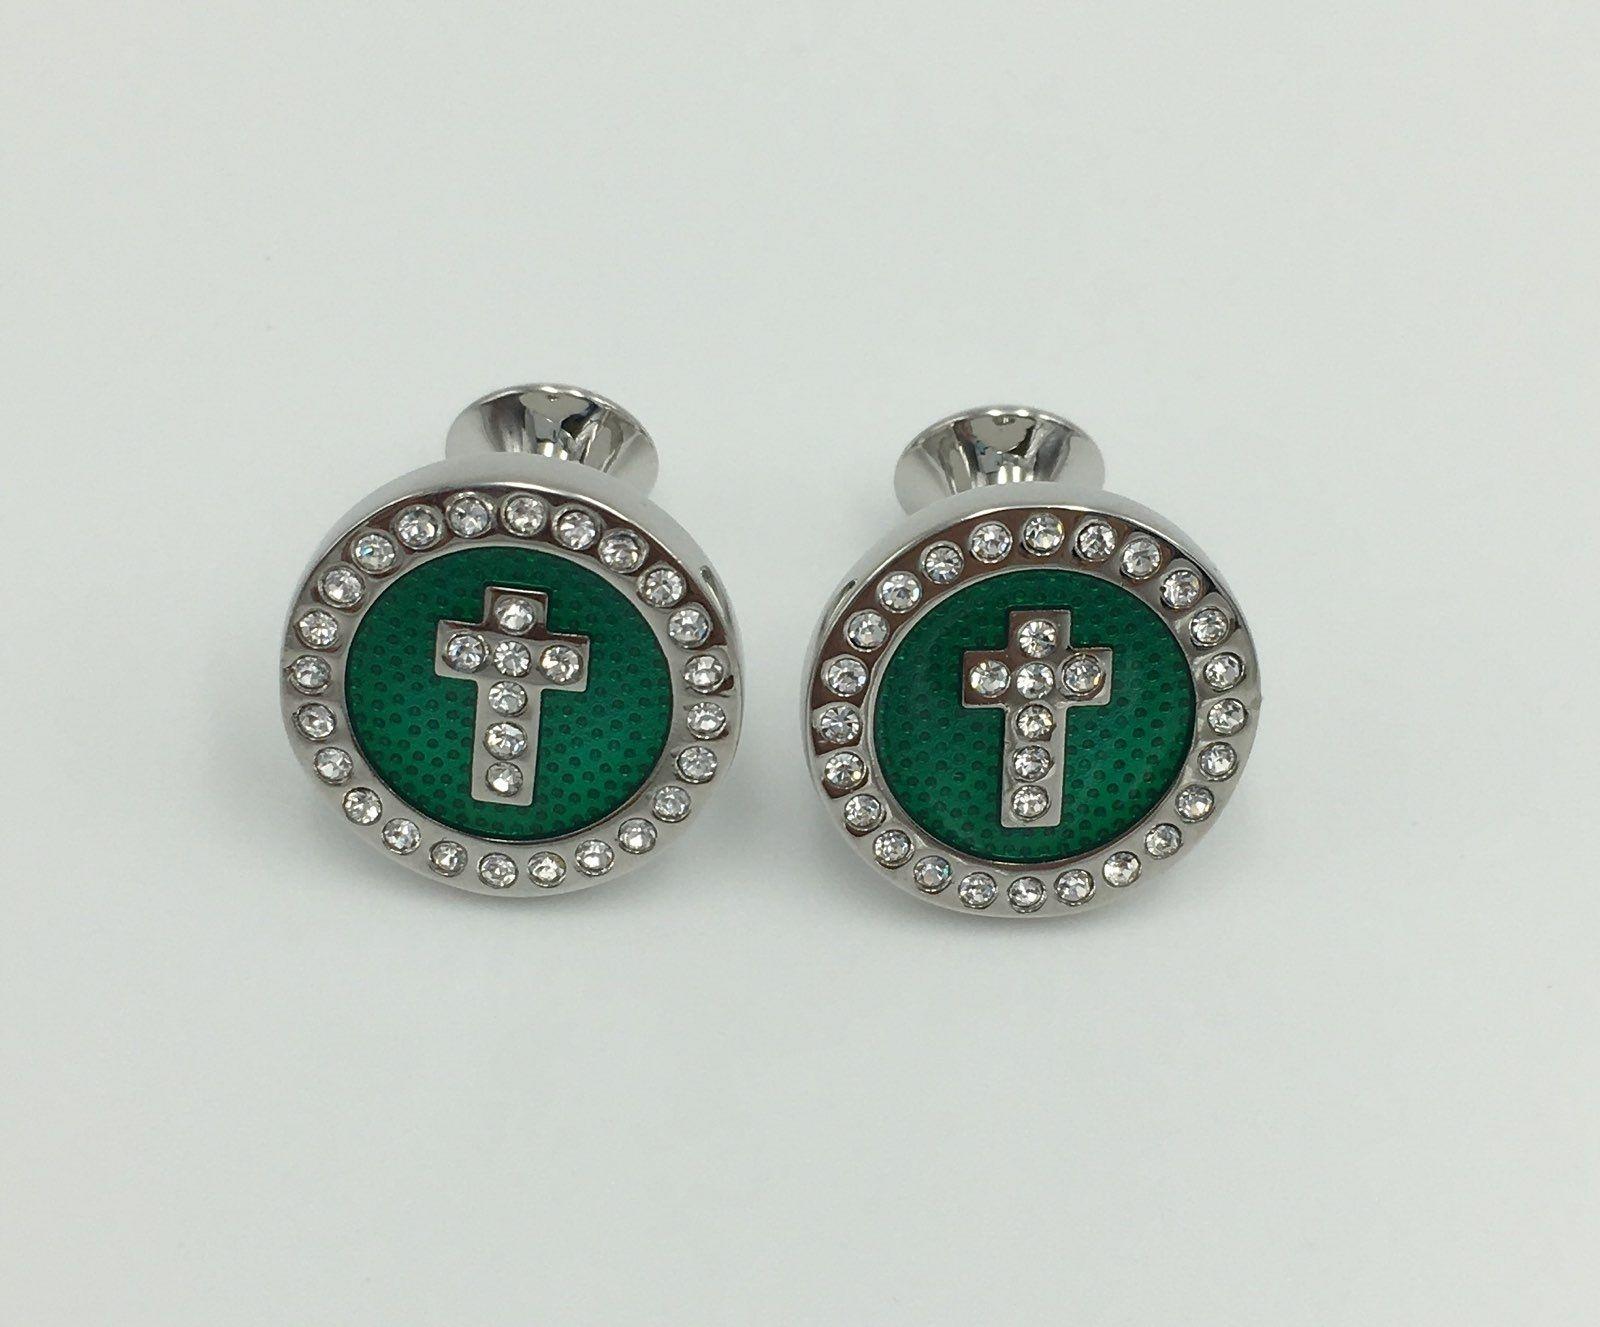 2 Pc. Noble Circle Cross Diamond Stone Cufflinks - Emerald Green